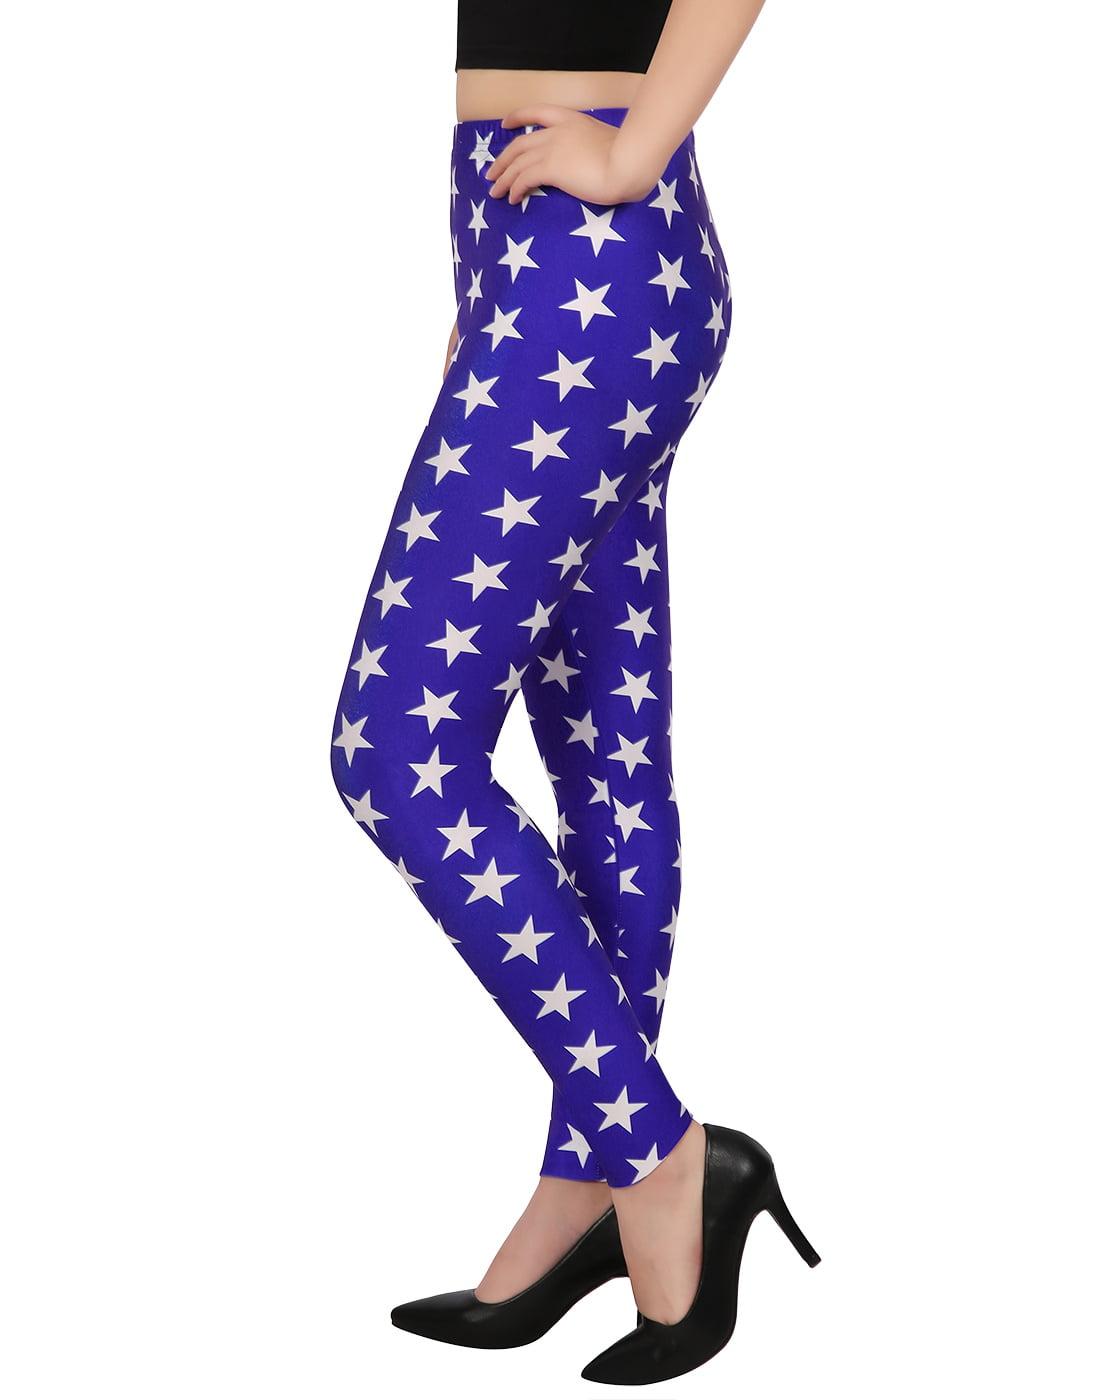 a98568266d16ad HDE - HDE Saint Patricks Day Leggings for Women St Pattys 4 Leaf Clover  Shamrock Pants - Small - Walmart.com